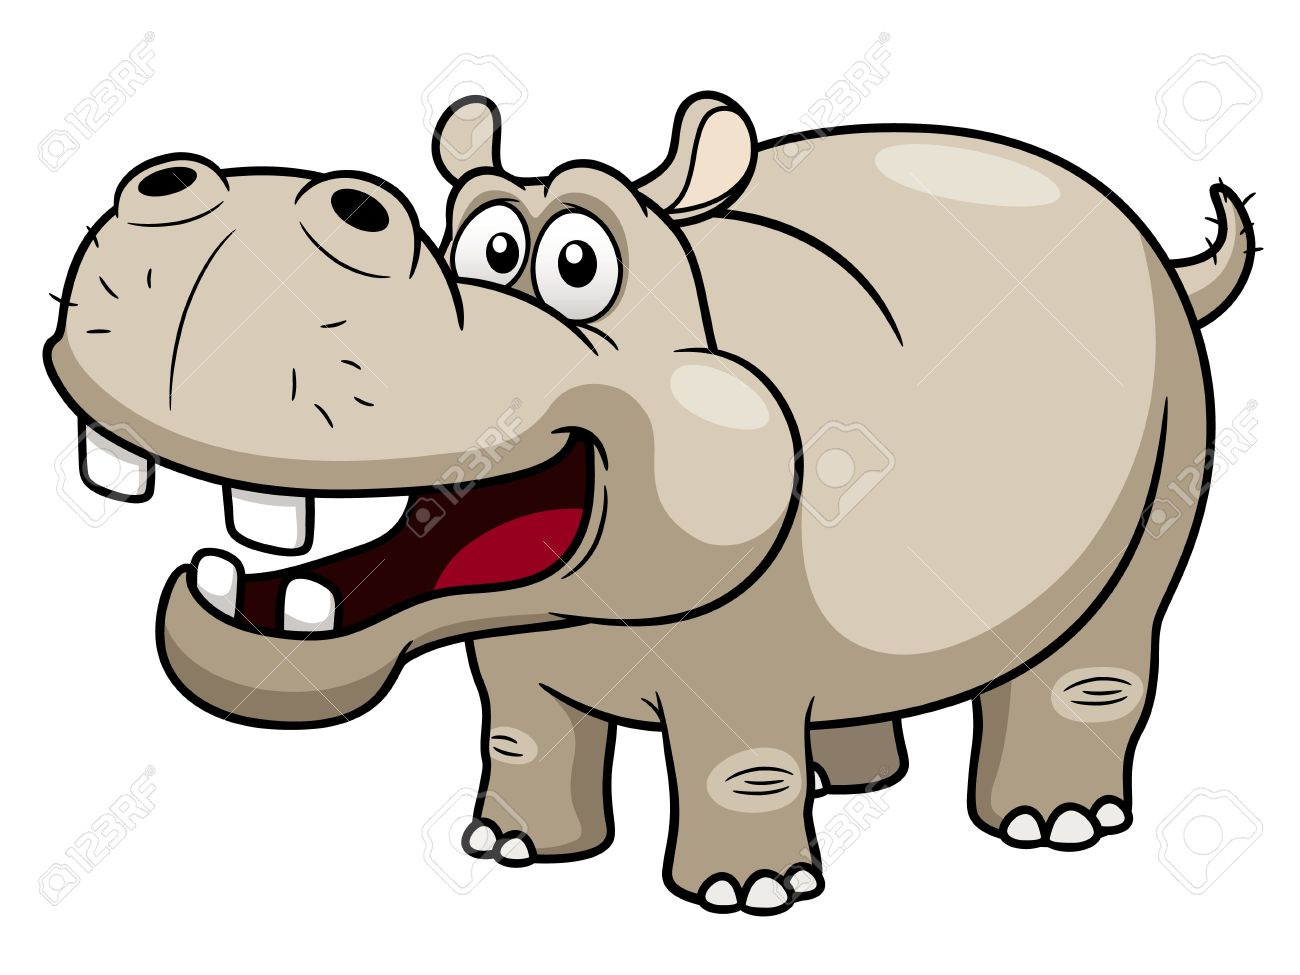 1300x975 Illustration Of Cartoon Hippopotamus Royalty Free Cliparts